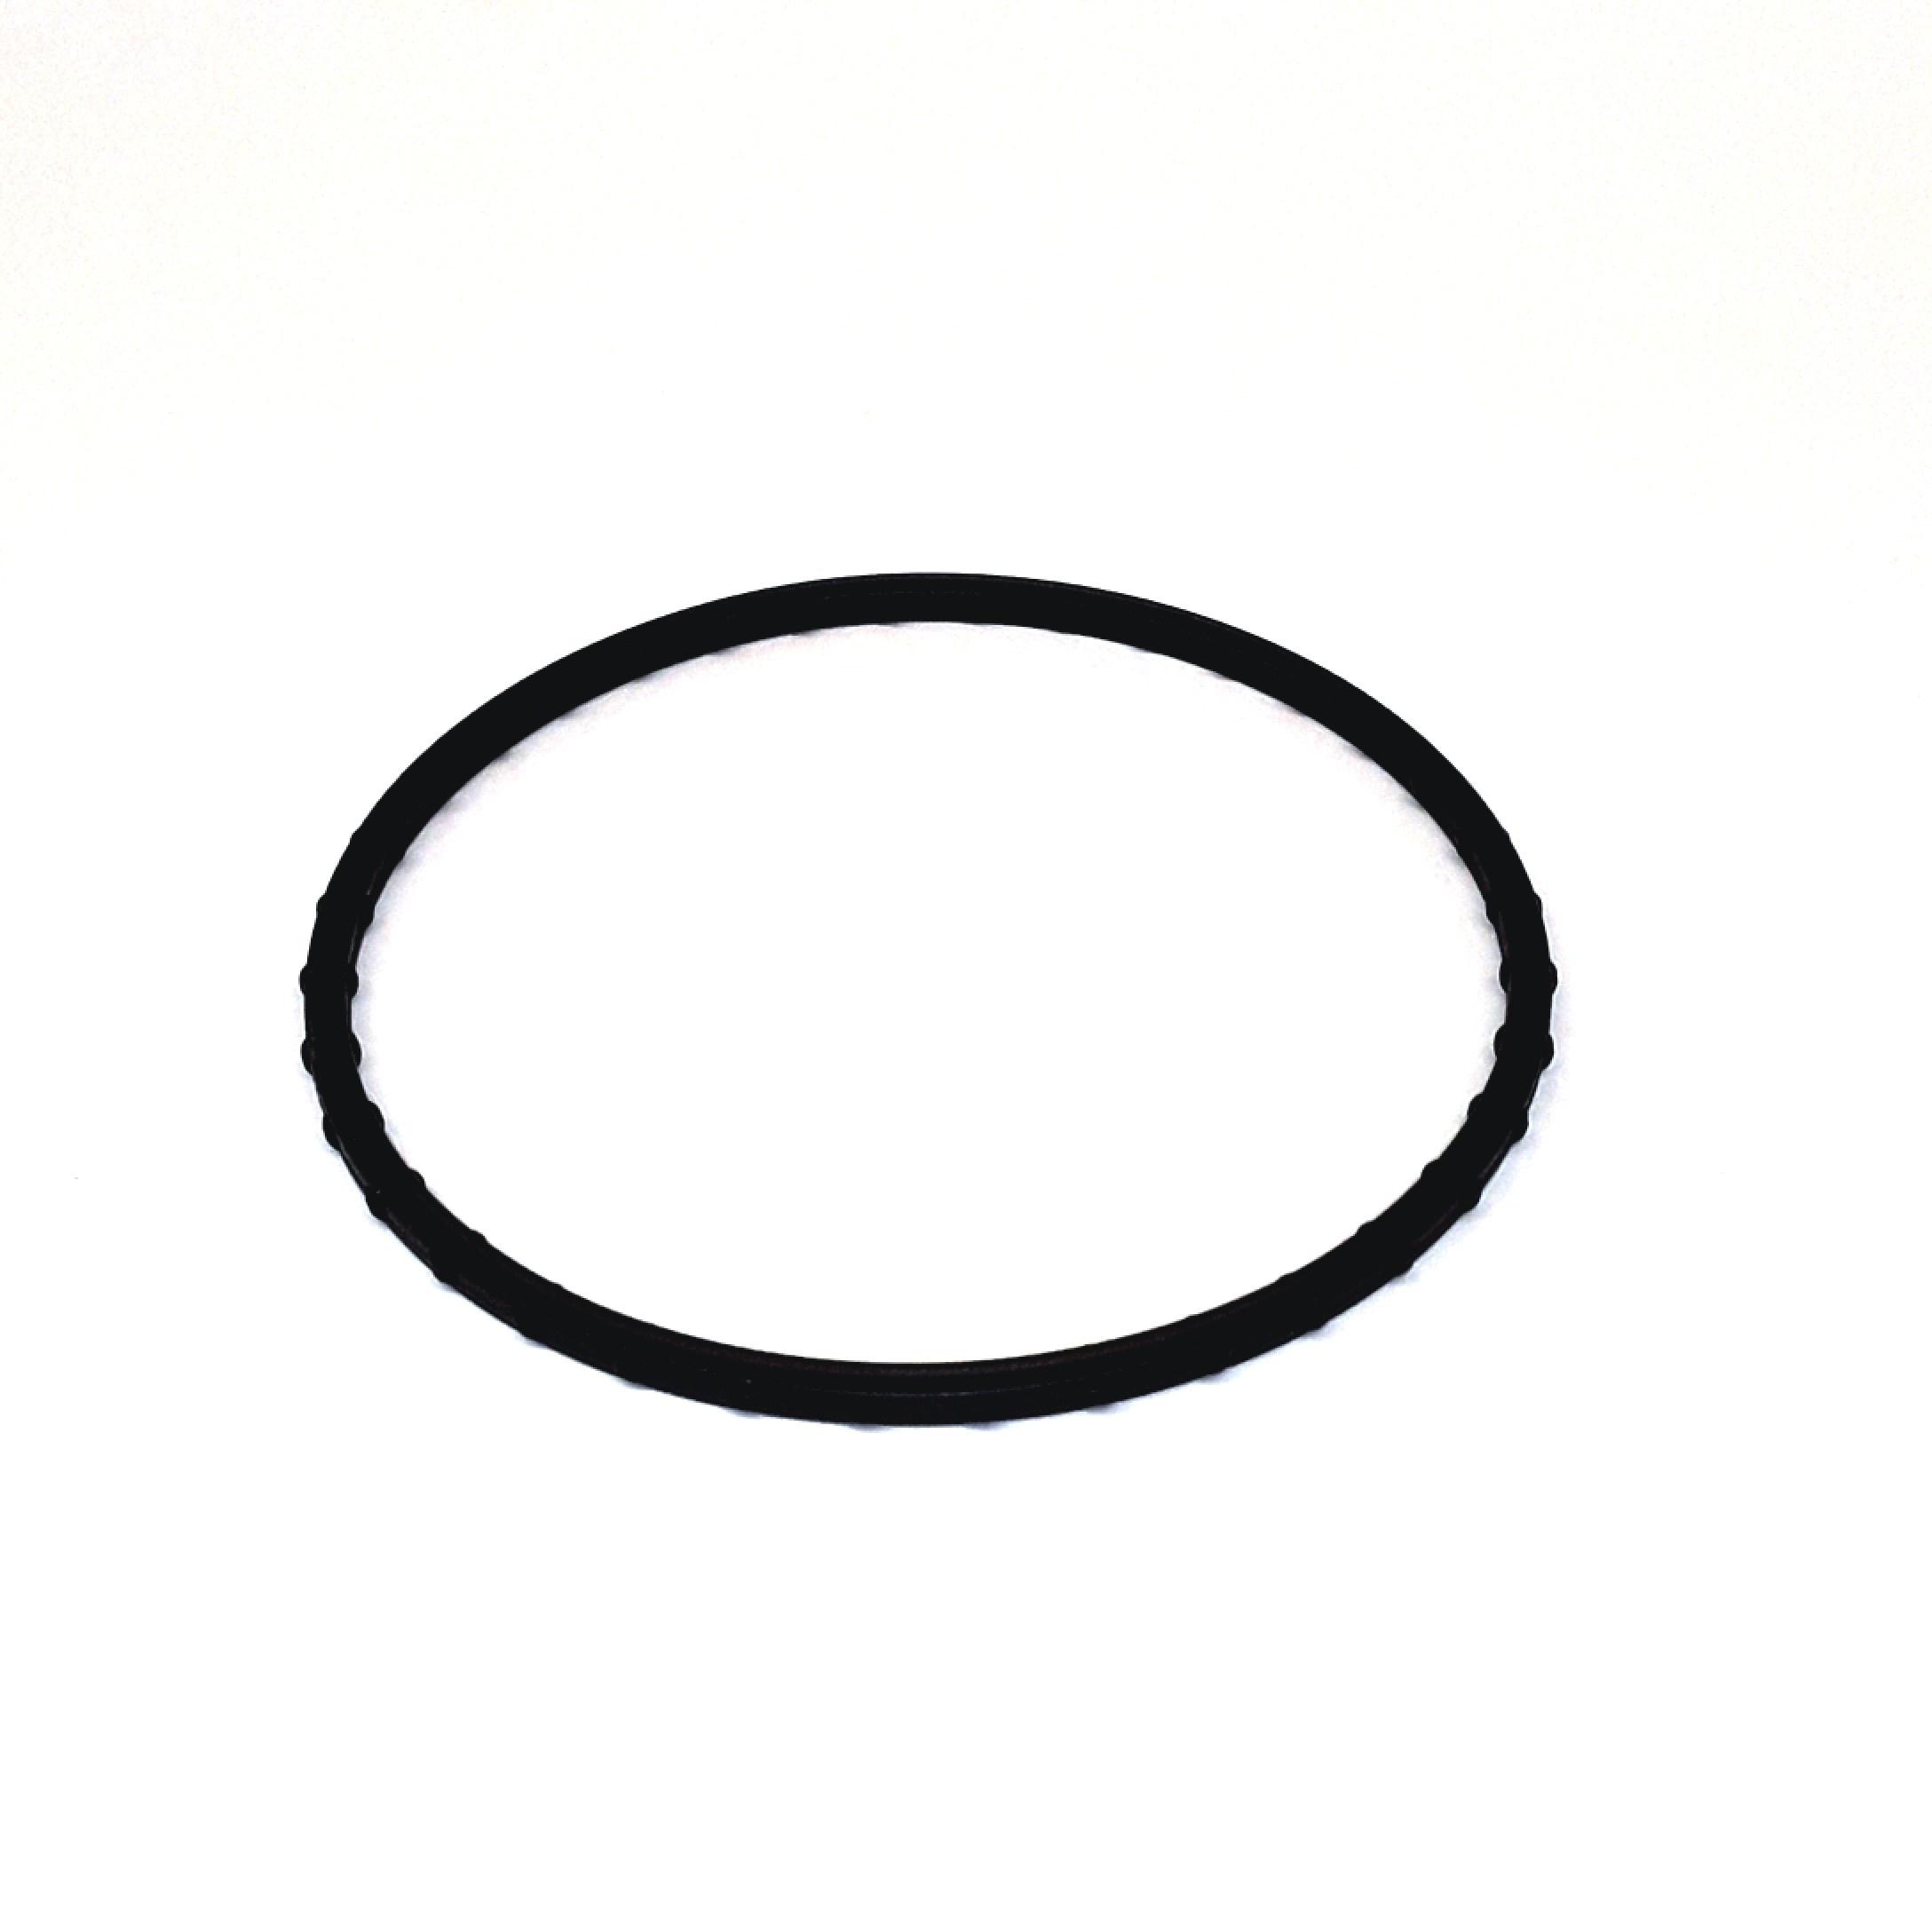 2010 volkswagen routan engine water pump gasket seal ring. Black Bedroom Furniture Sets. Home Design Ideas